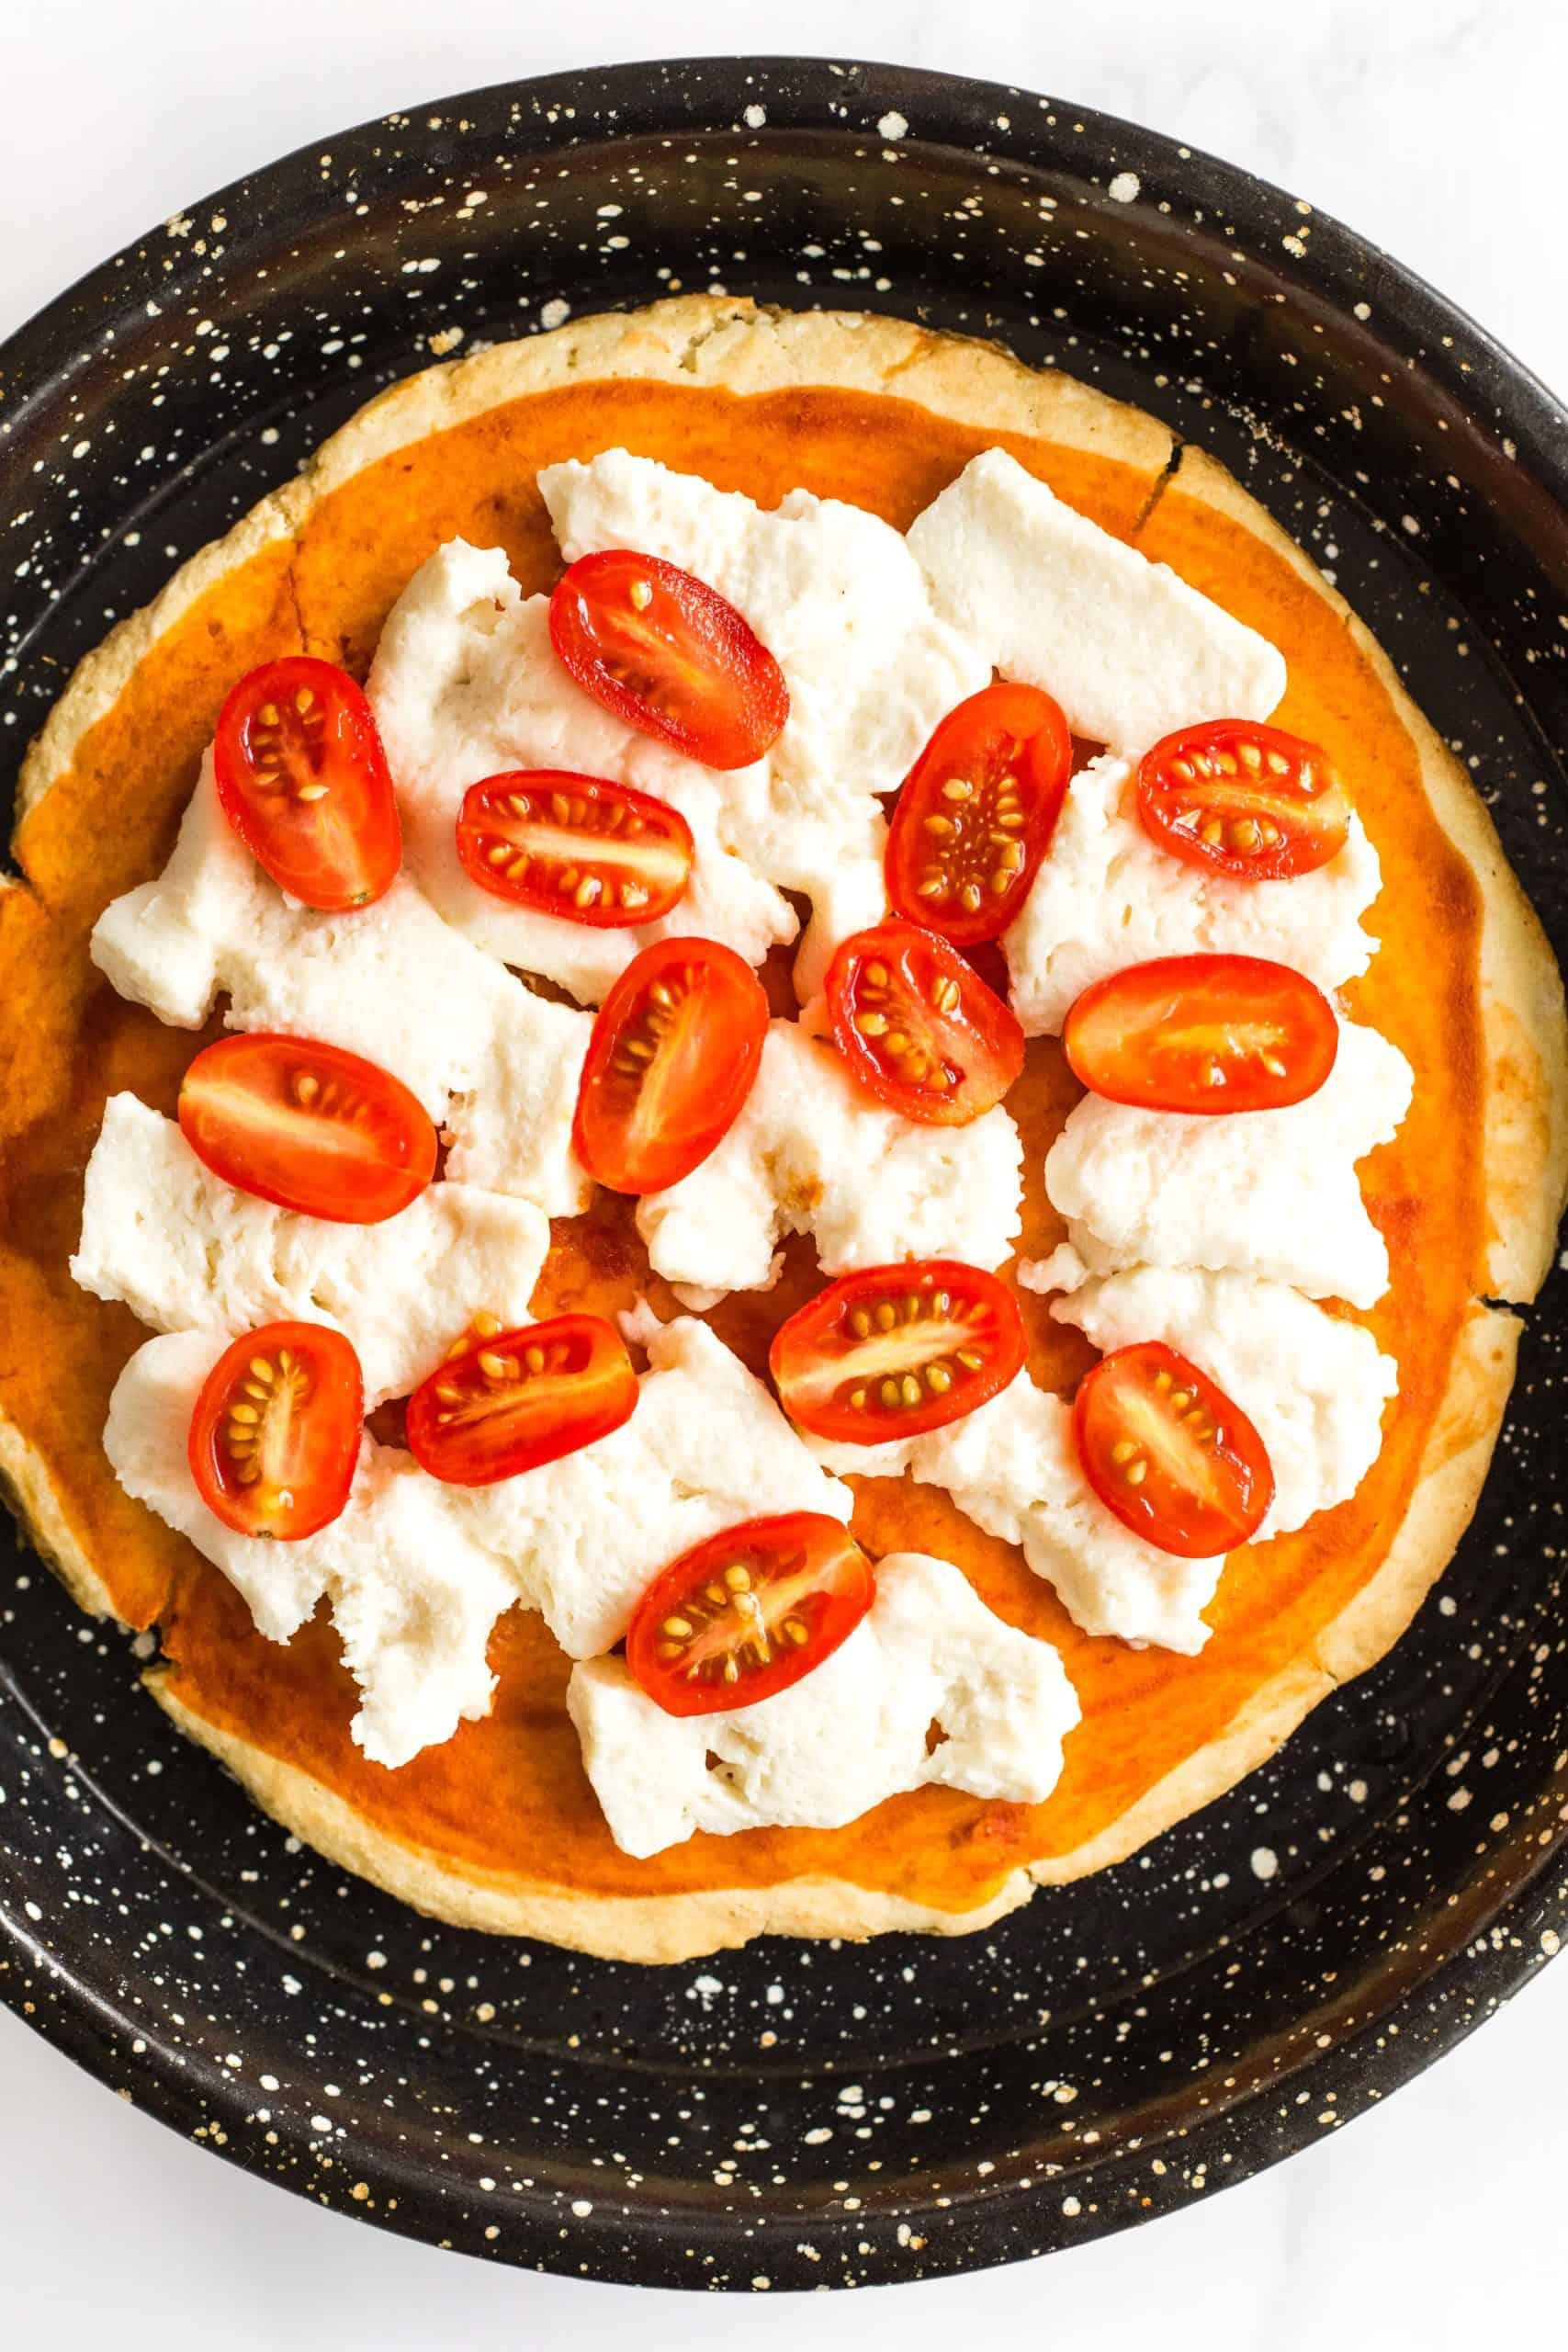 Gluten-free pizza crust with mozzarella cheese and cherry tomato halves.